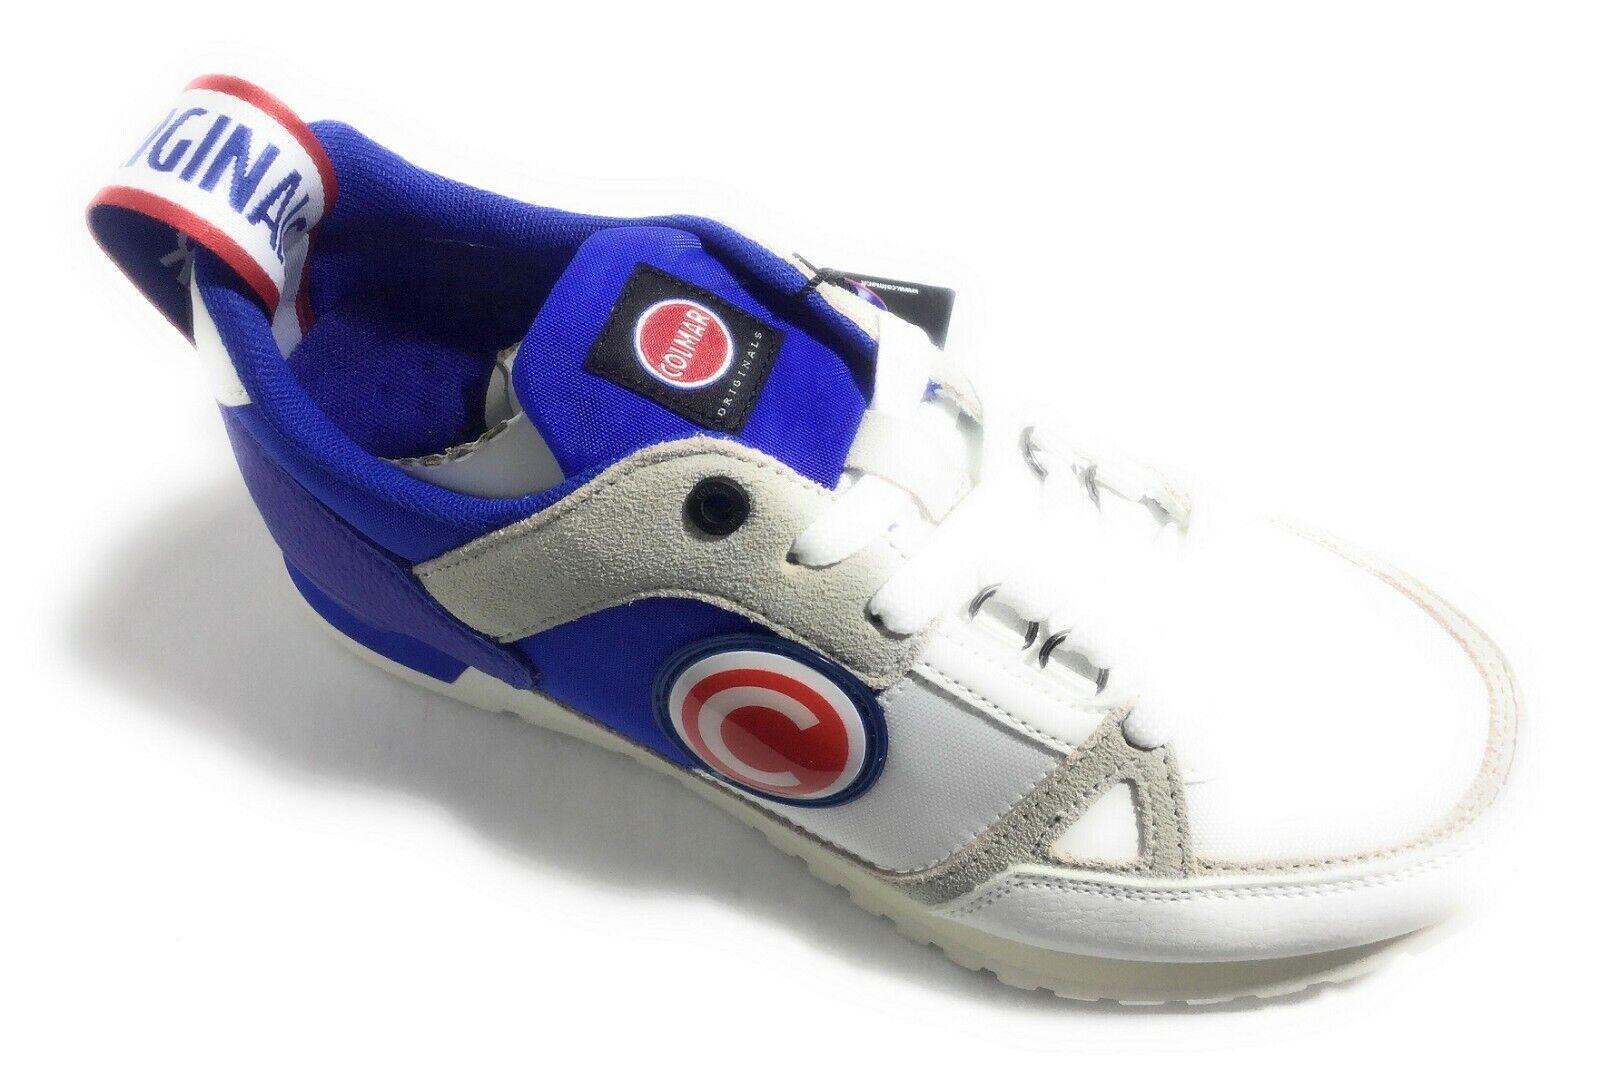 Colmar Supreme Mabro O. By O. 200 blancooo Royal zapatos hombres Casual zapatillas Man